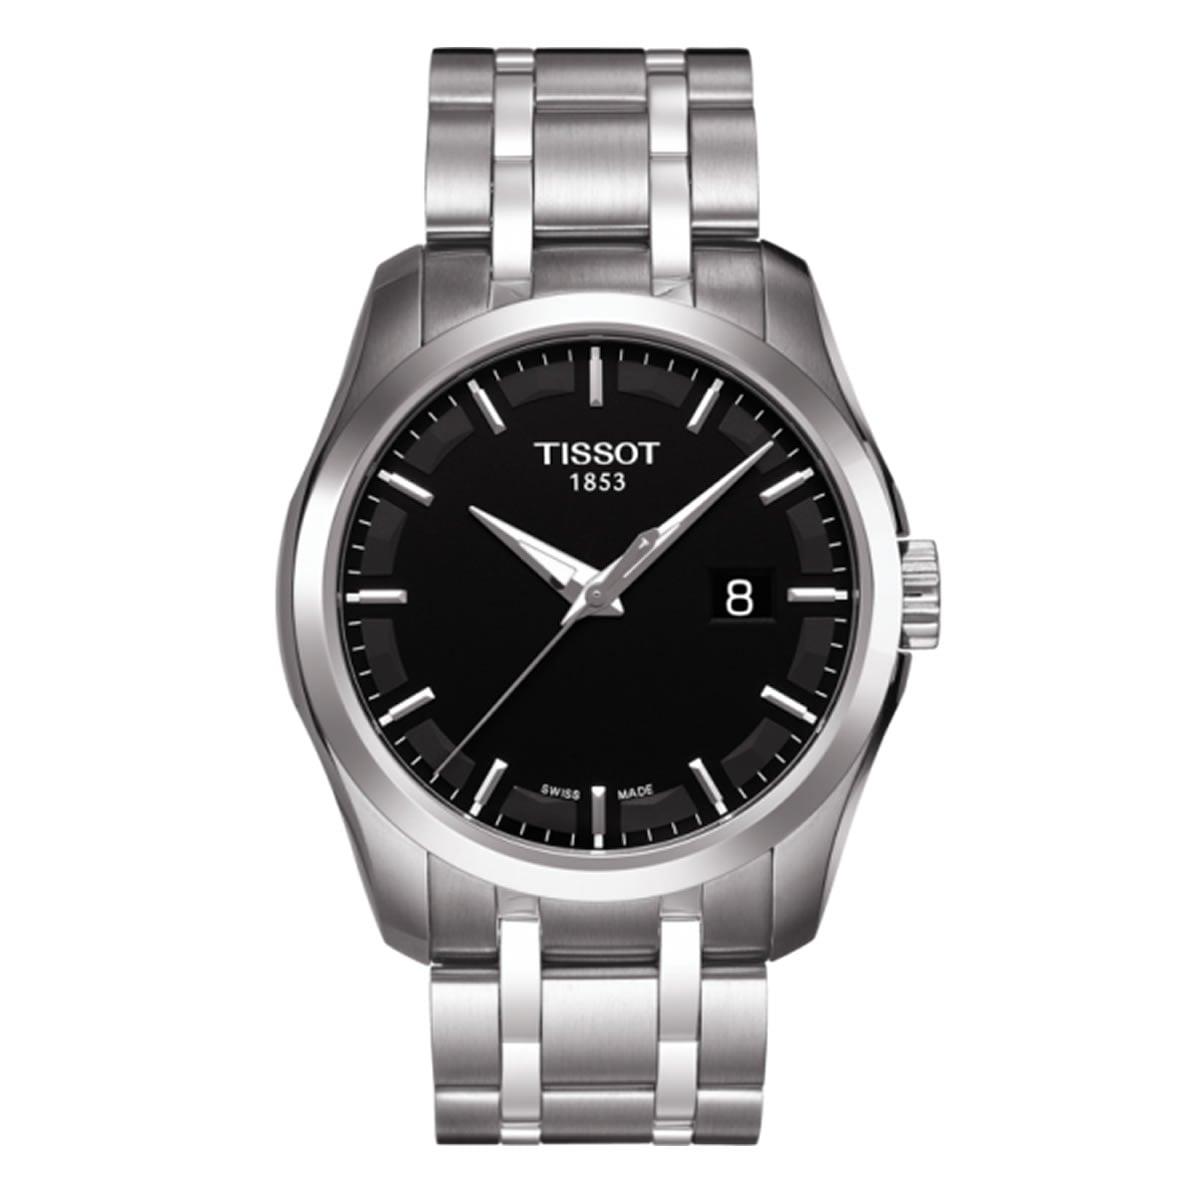 Tissot(ティソ) Couturier(クチュリエ )t0354101105100